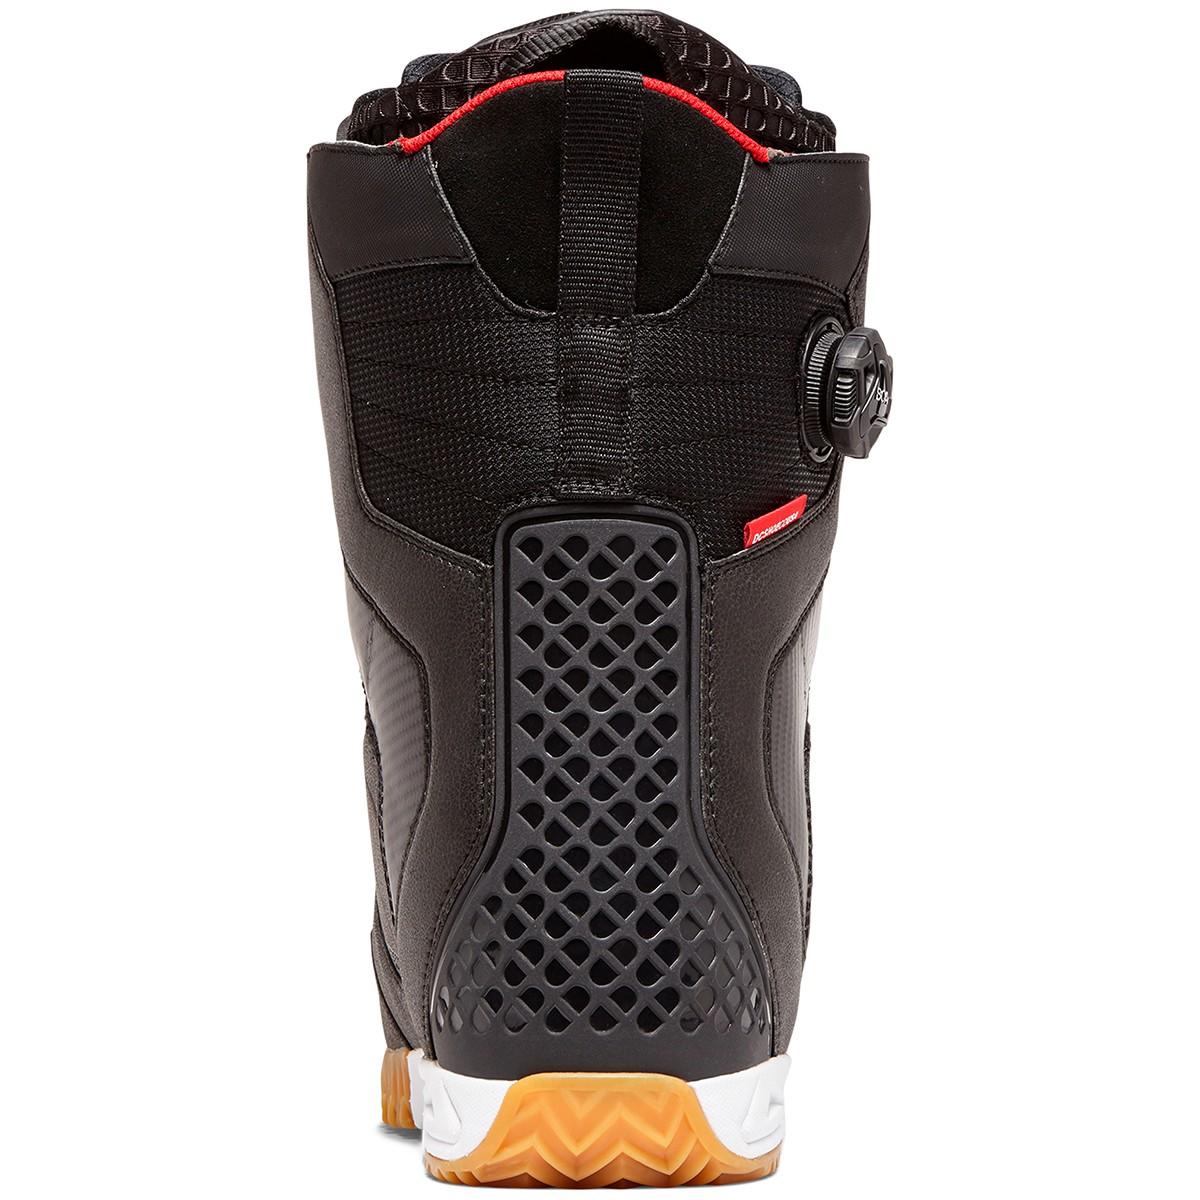 Ботинки для сноуборда DC SHUKSAN M BOA X 19-20, Black